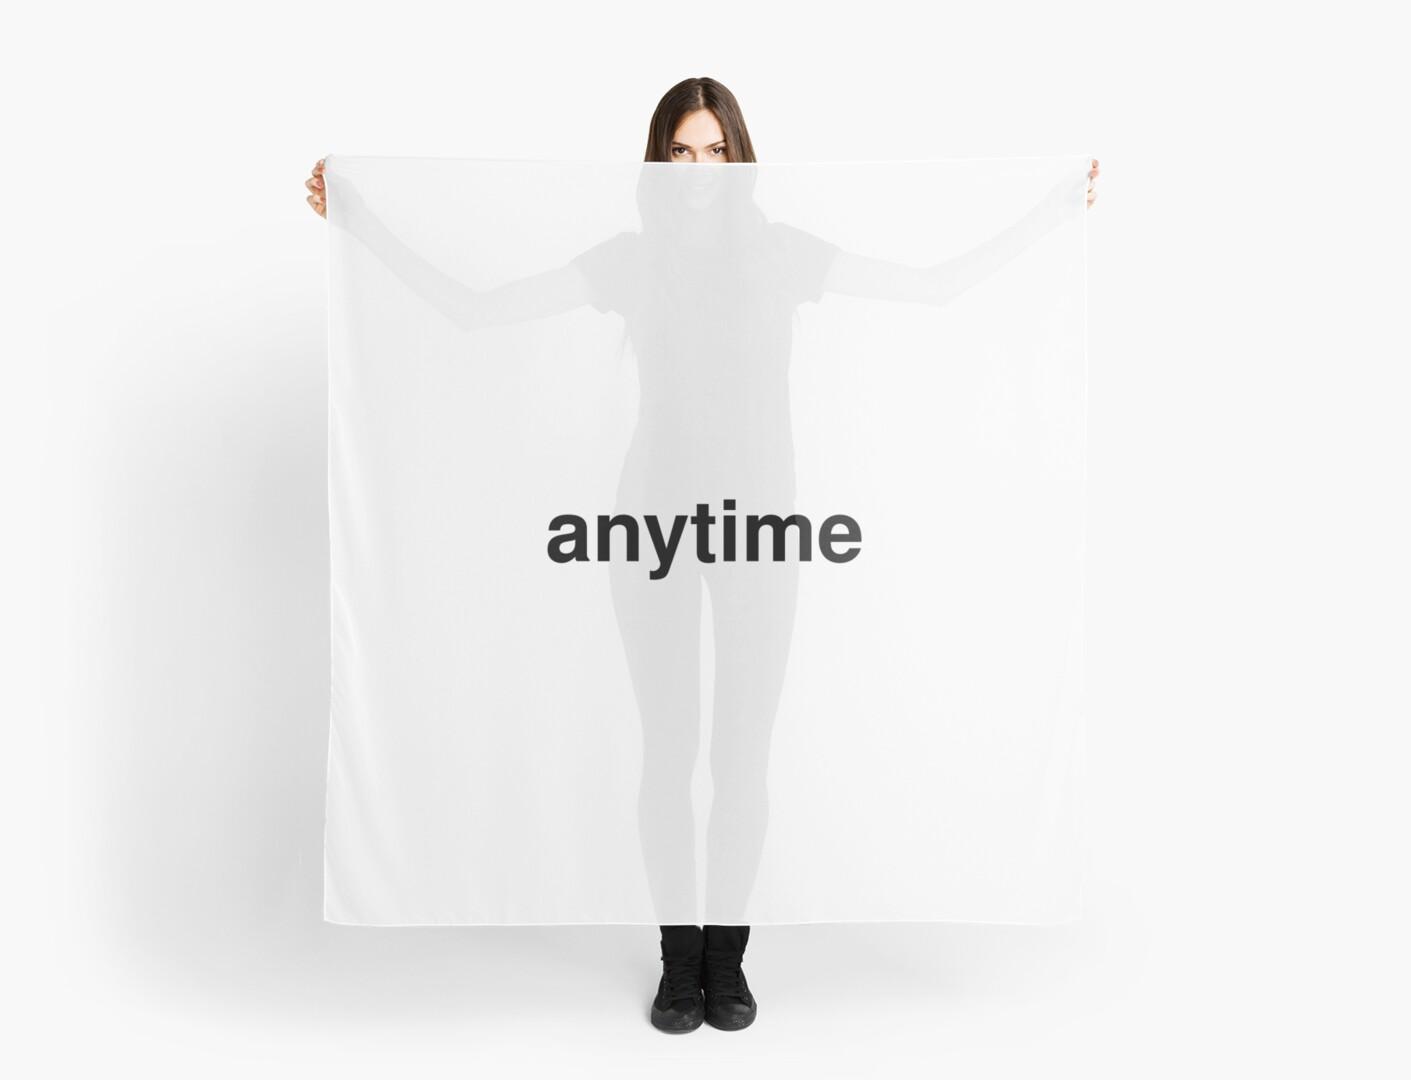 anytime by ninov94